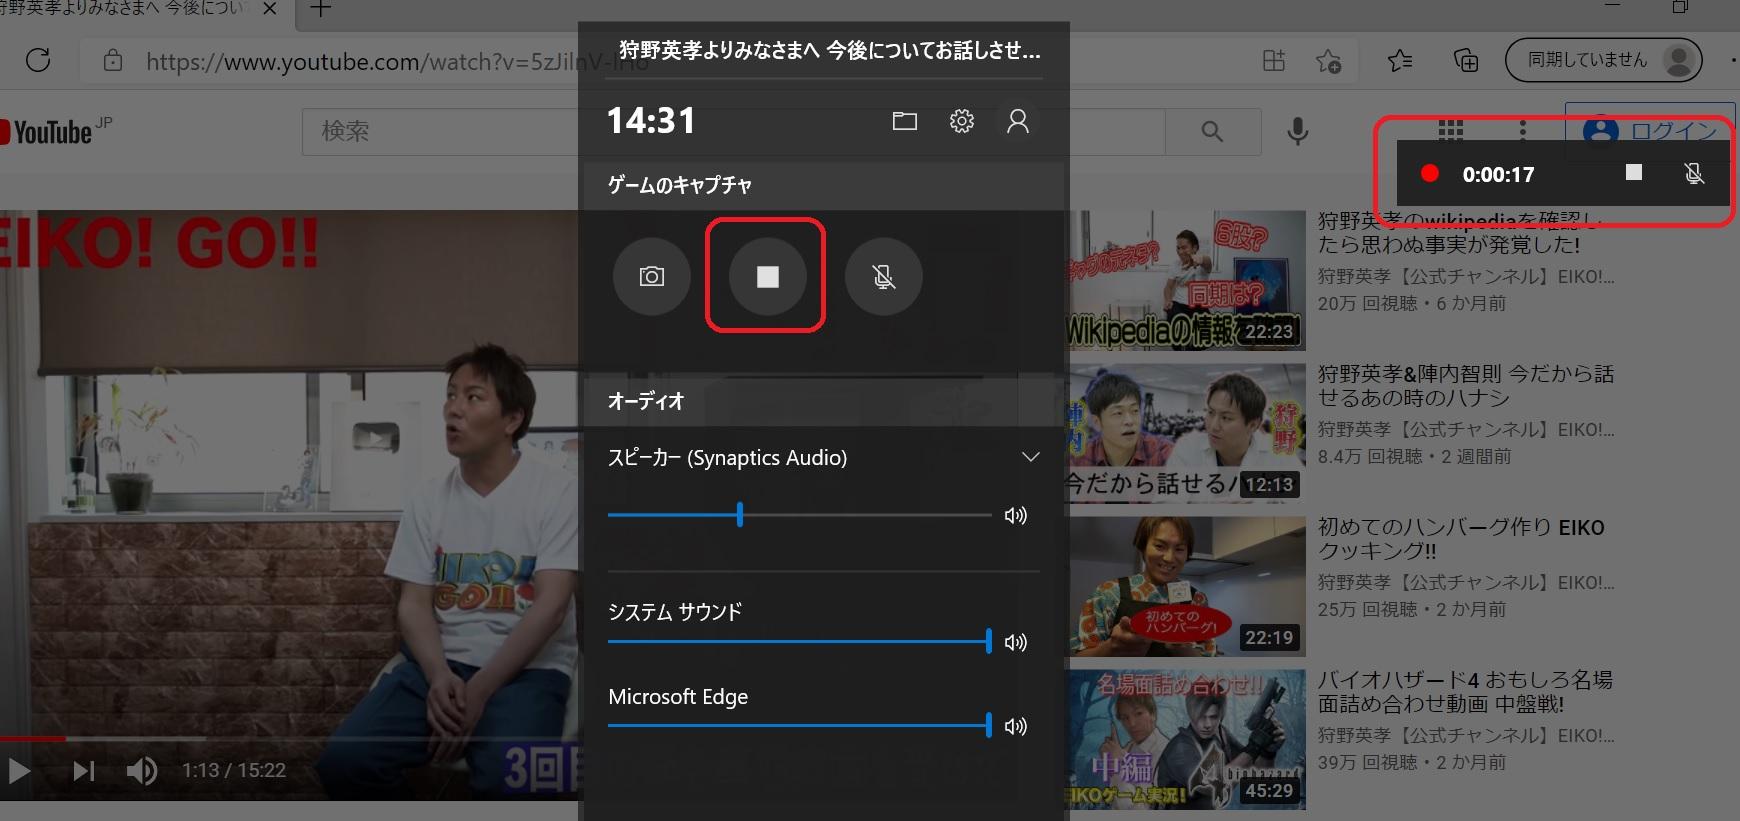 xbox game bar 録画停止jpg